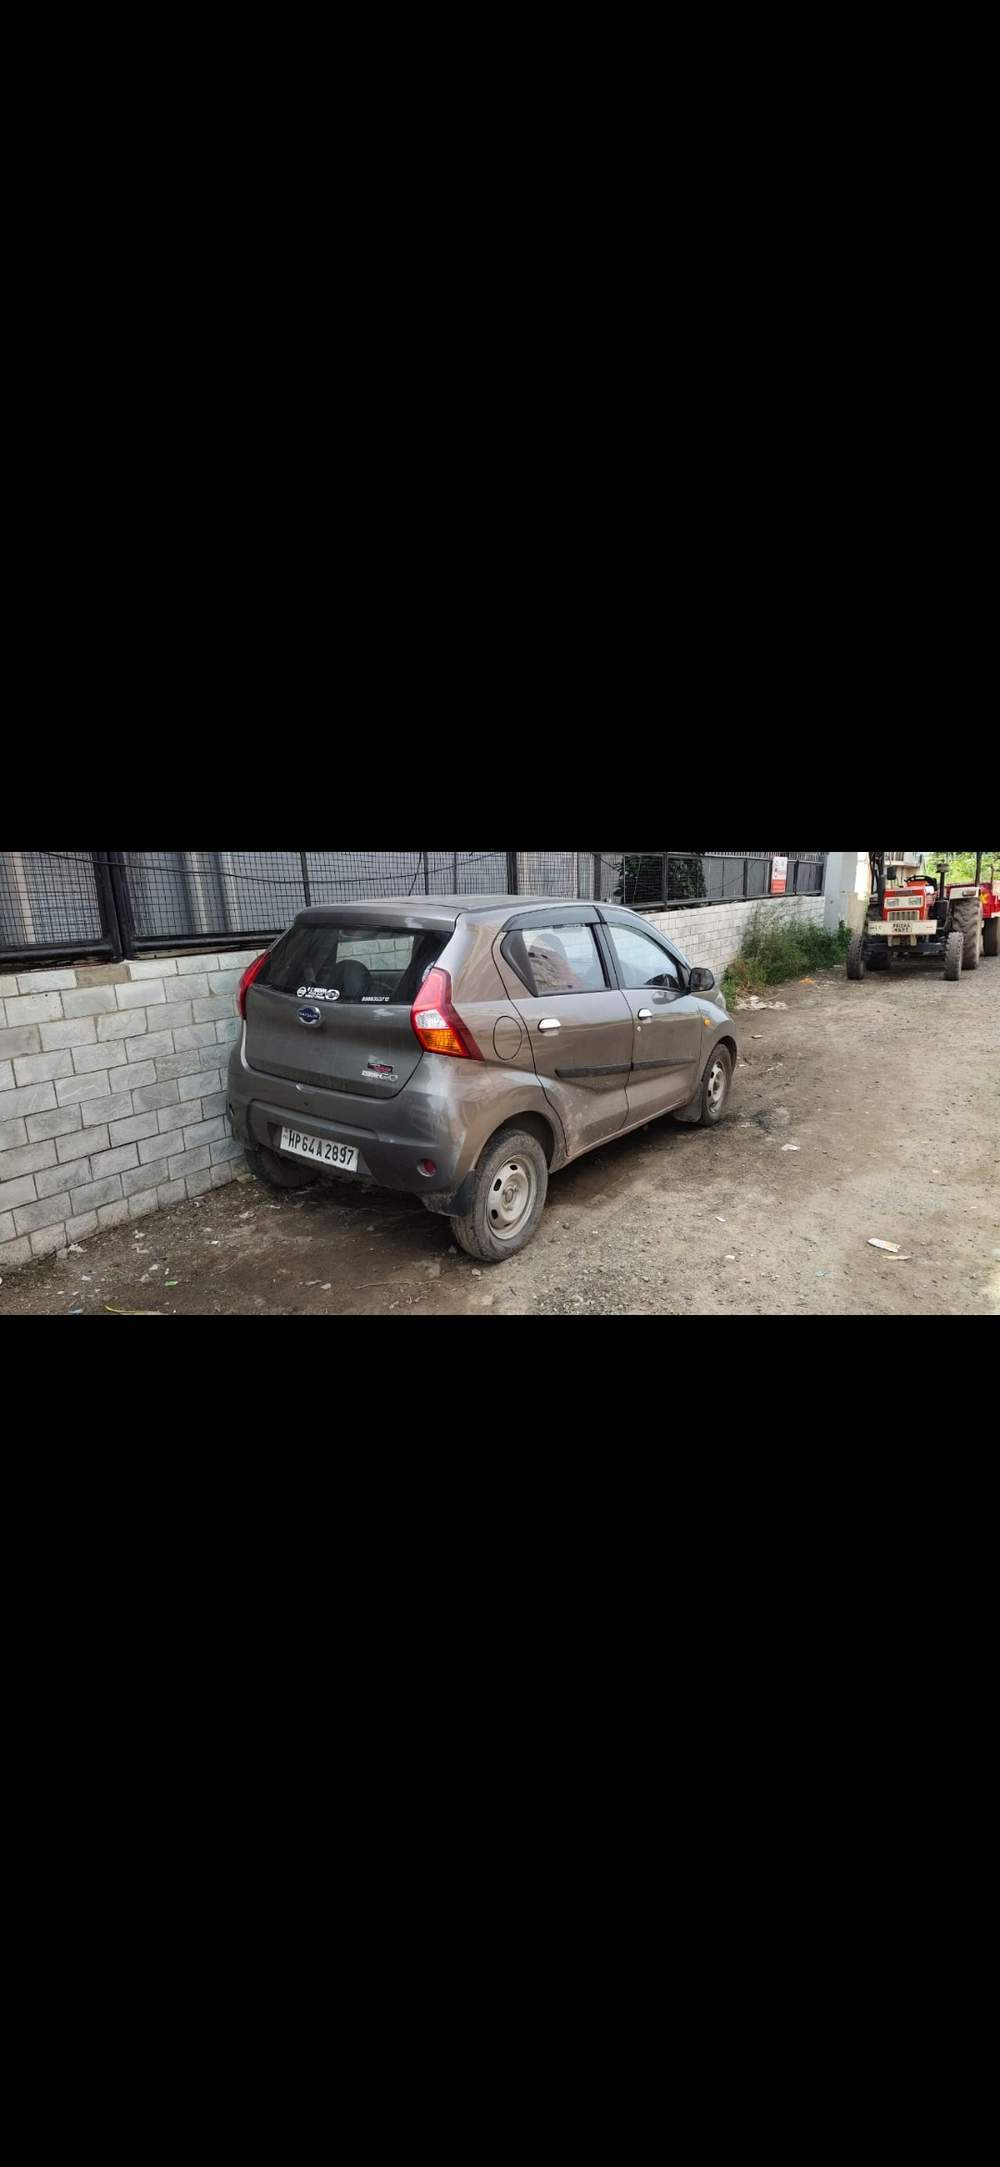 Datsun Redi Go Front Left Rim